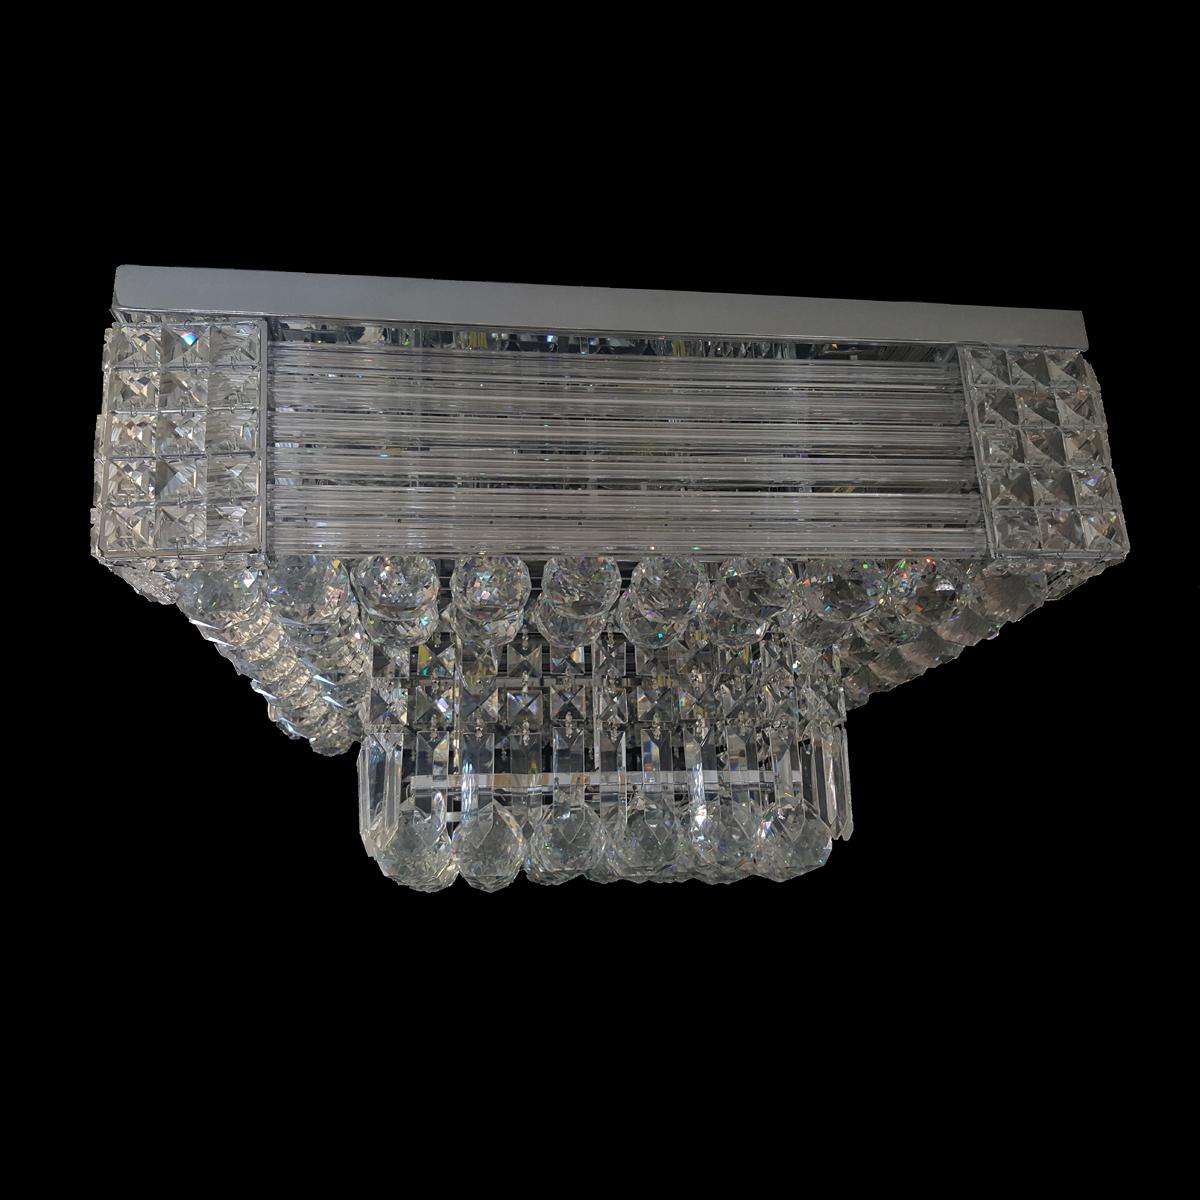 Midland 500 Chrome Ceiling Light - CTCMID12500CH